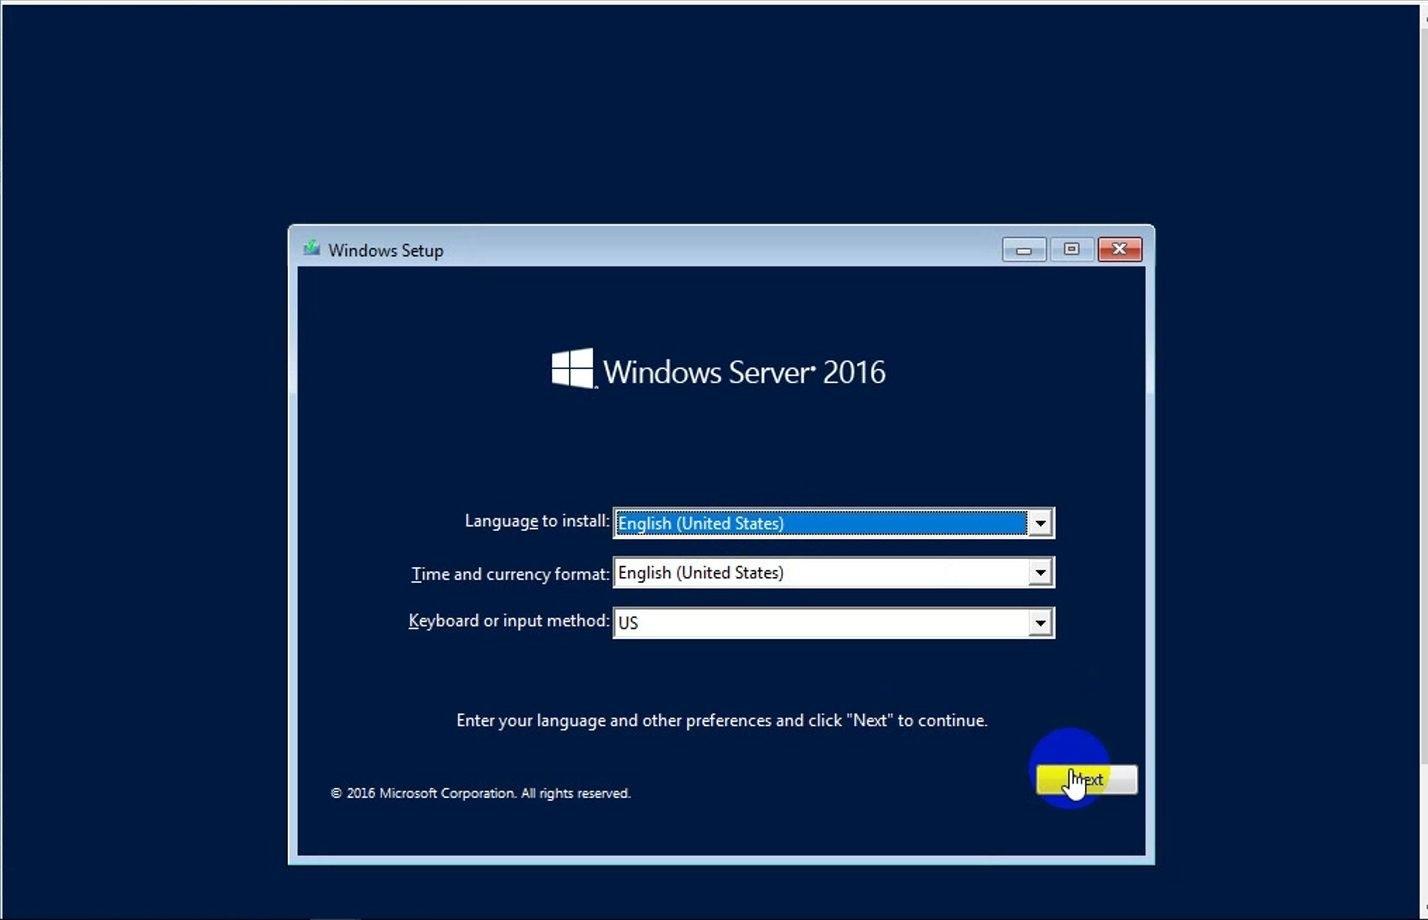 ITFORVN Bài 1 Part1 Cài đặt Windows Server 2016 20 e1491171737301 - [Tự học MCSA MCSE 2016] - Lab-1-Part1-Cài đặt Windows Server 2016